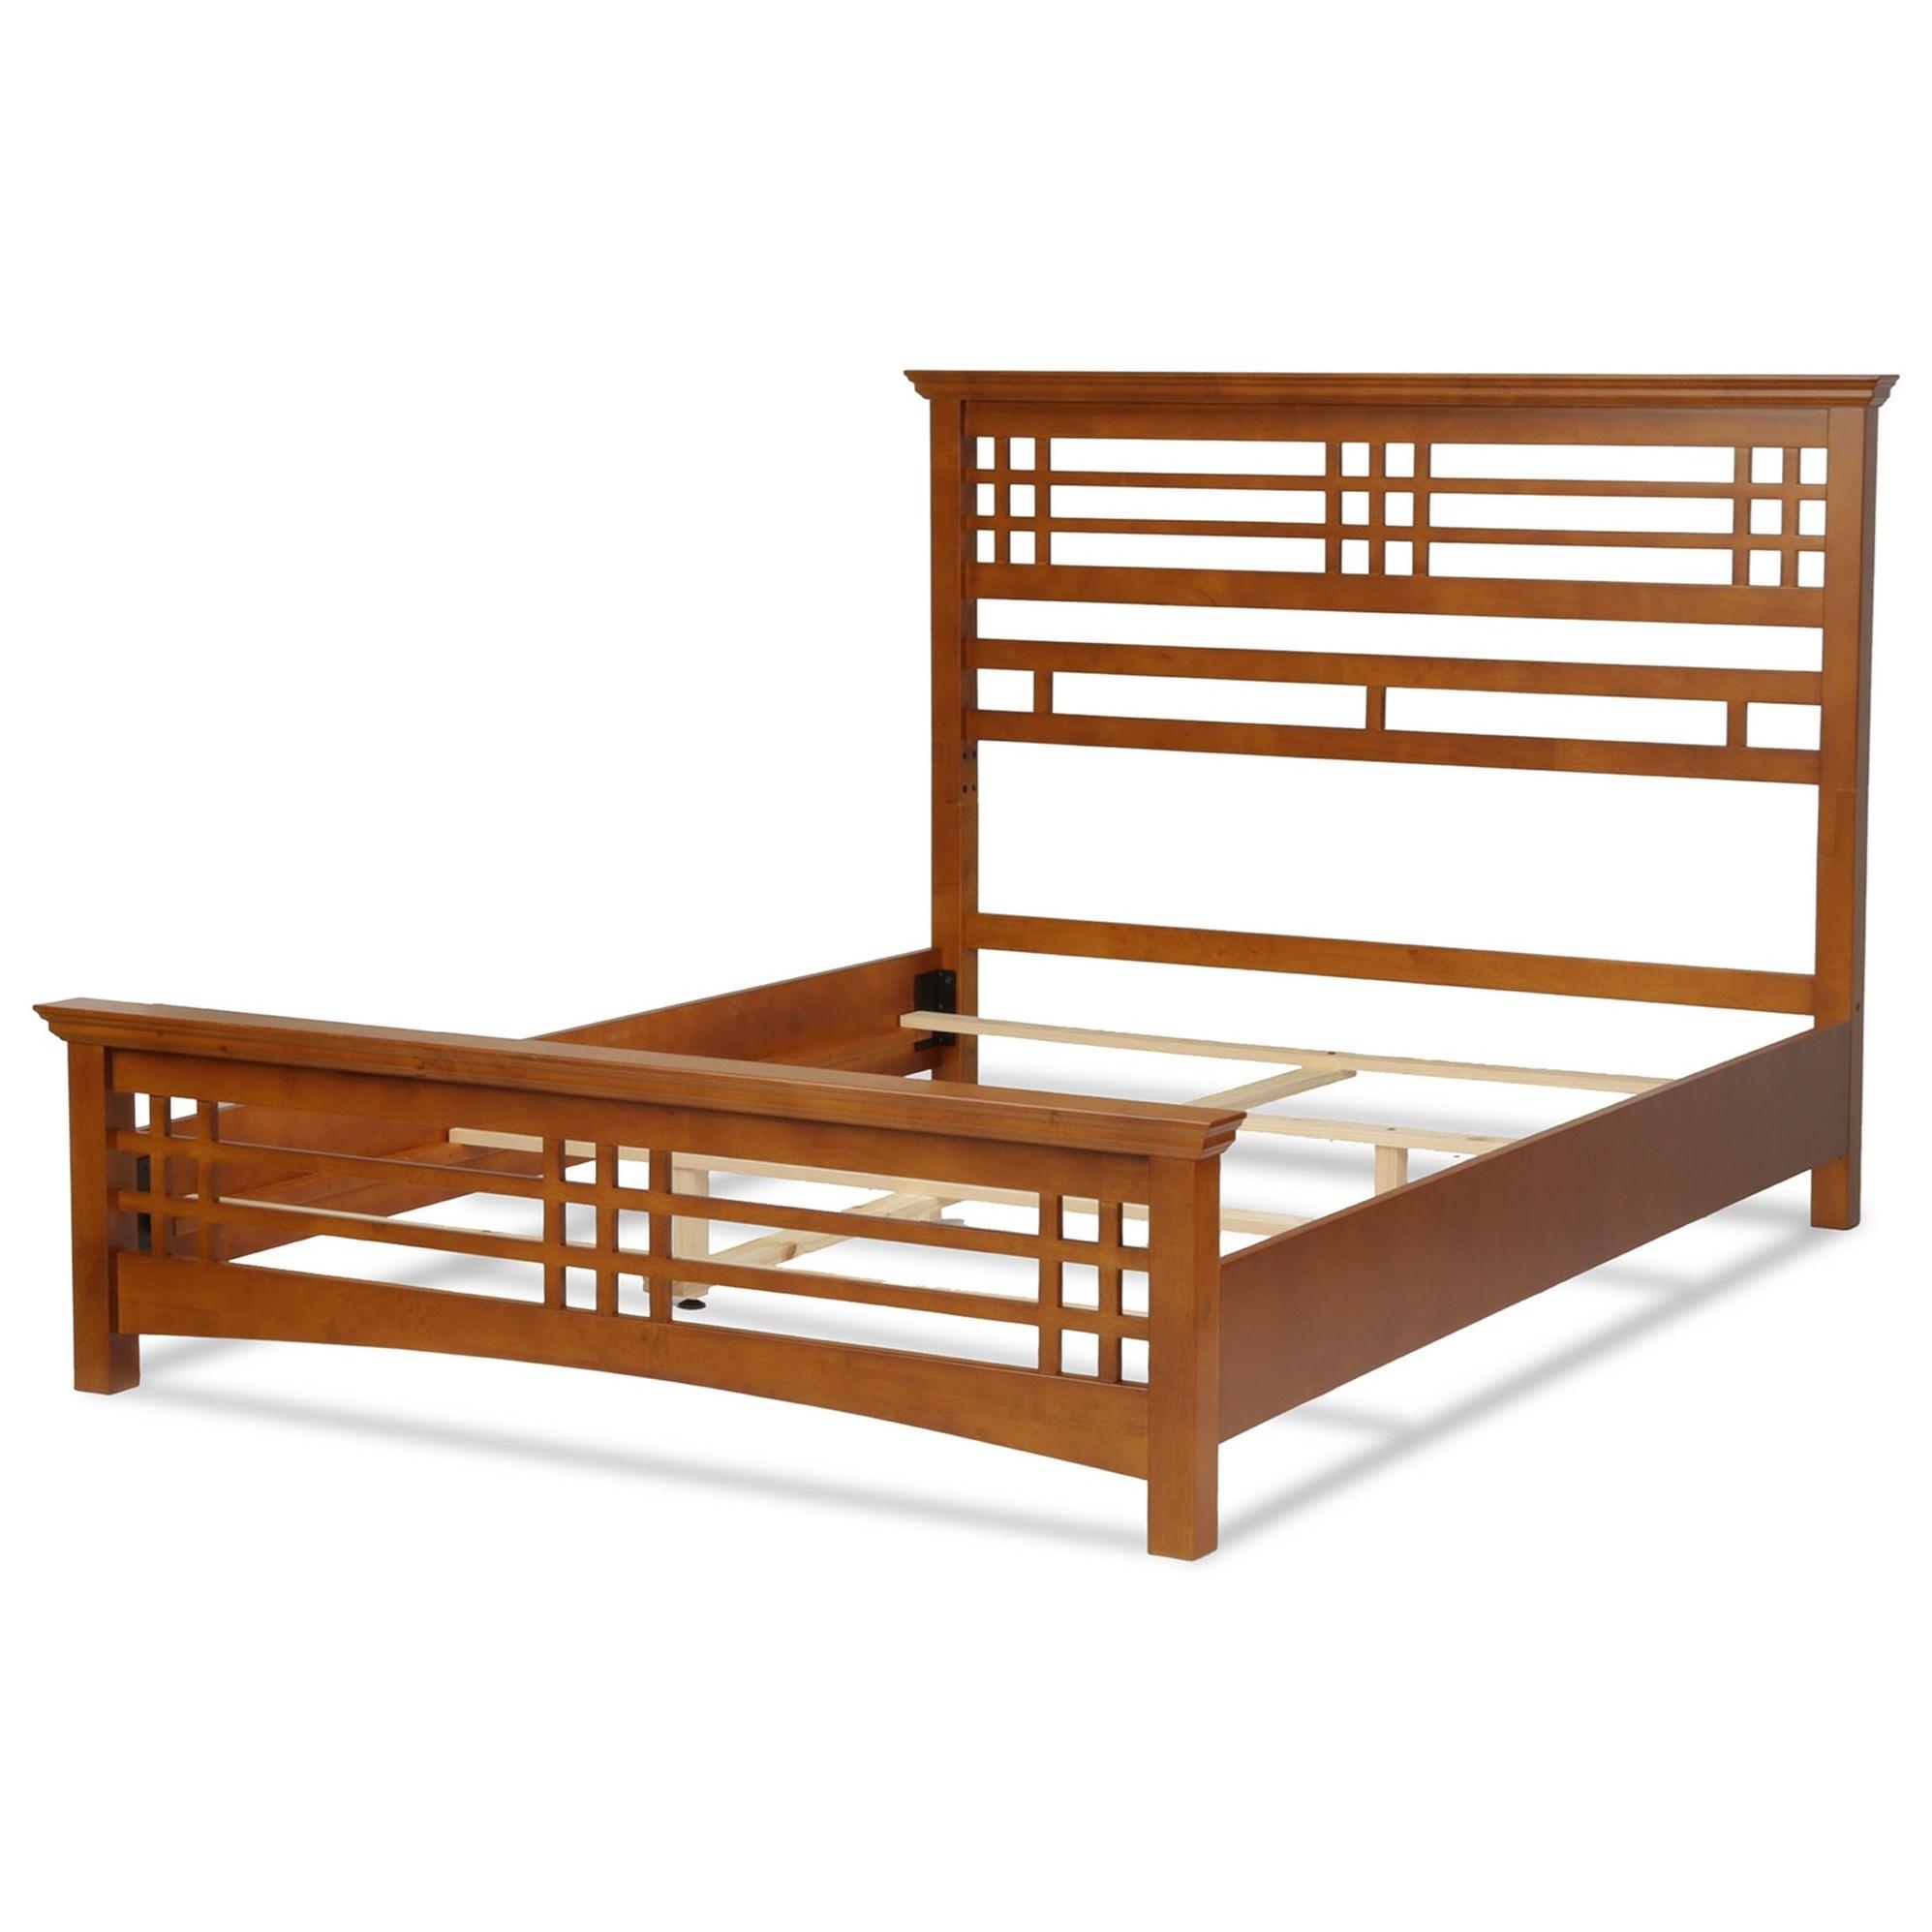 Wood Avery Cal King Bed by Fashion Bed Group at SlumberWorld